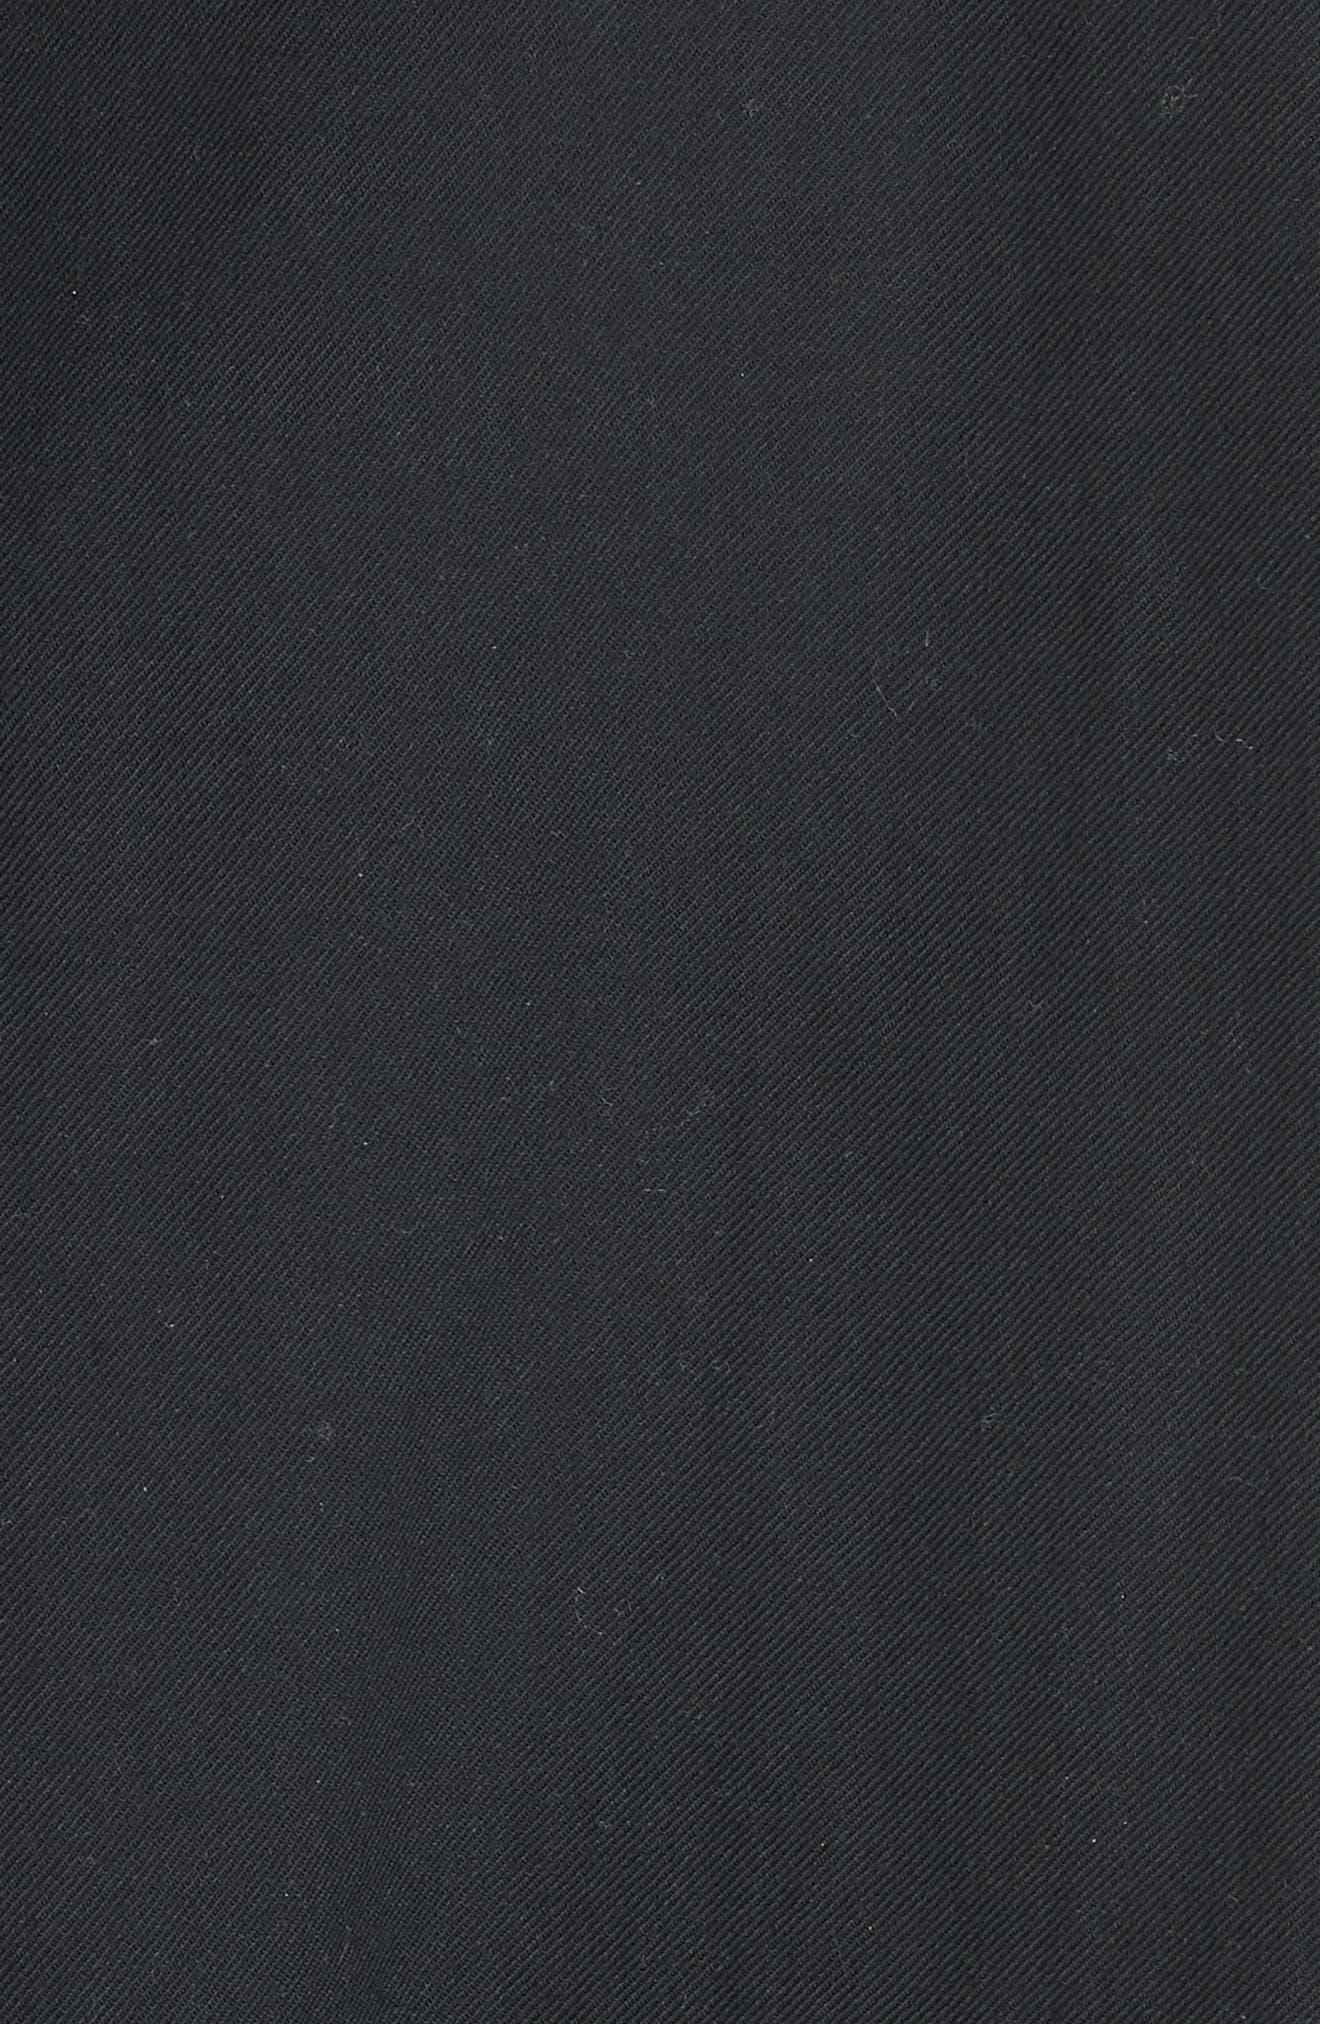 Shirred Cotton Blouse,                             Alternate thumbnail 5, color,                             Black